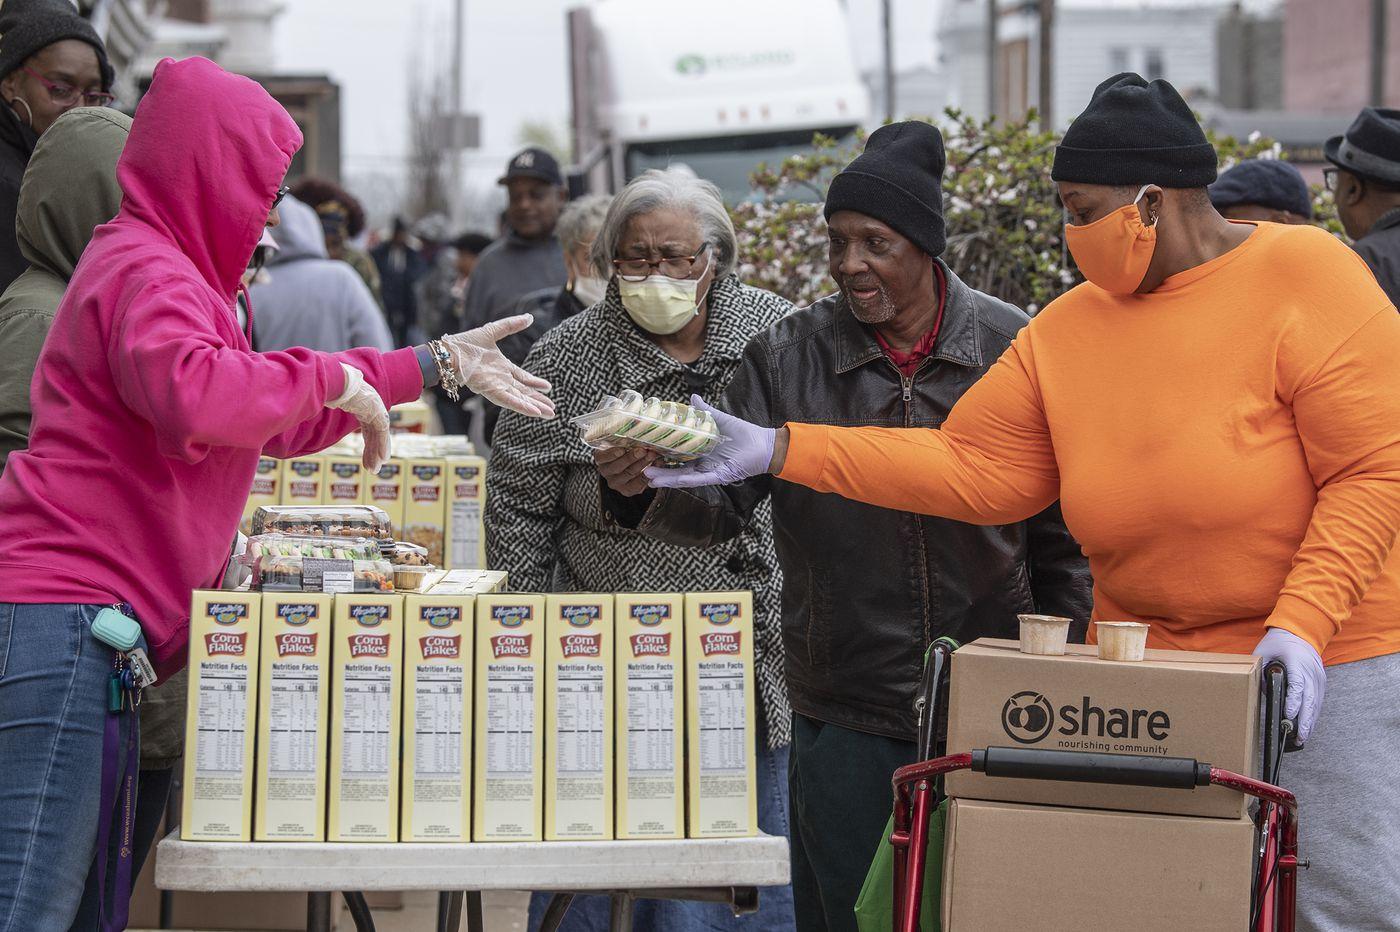 Flyers donate $250,000 to help Philabundance feed people during coronavirus pandemic